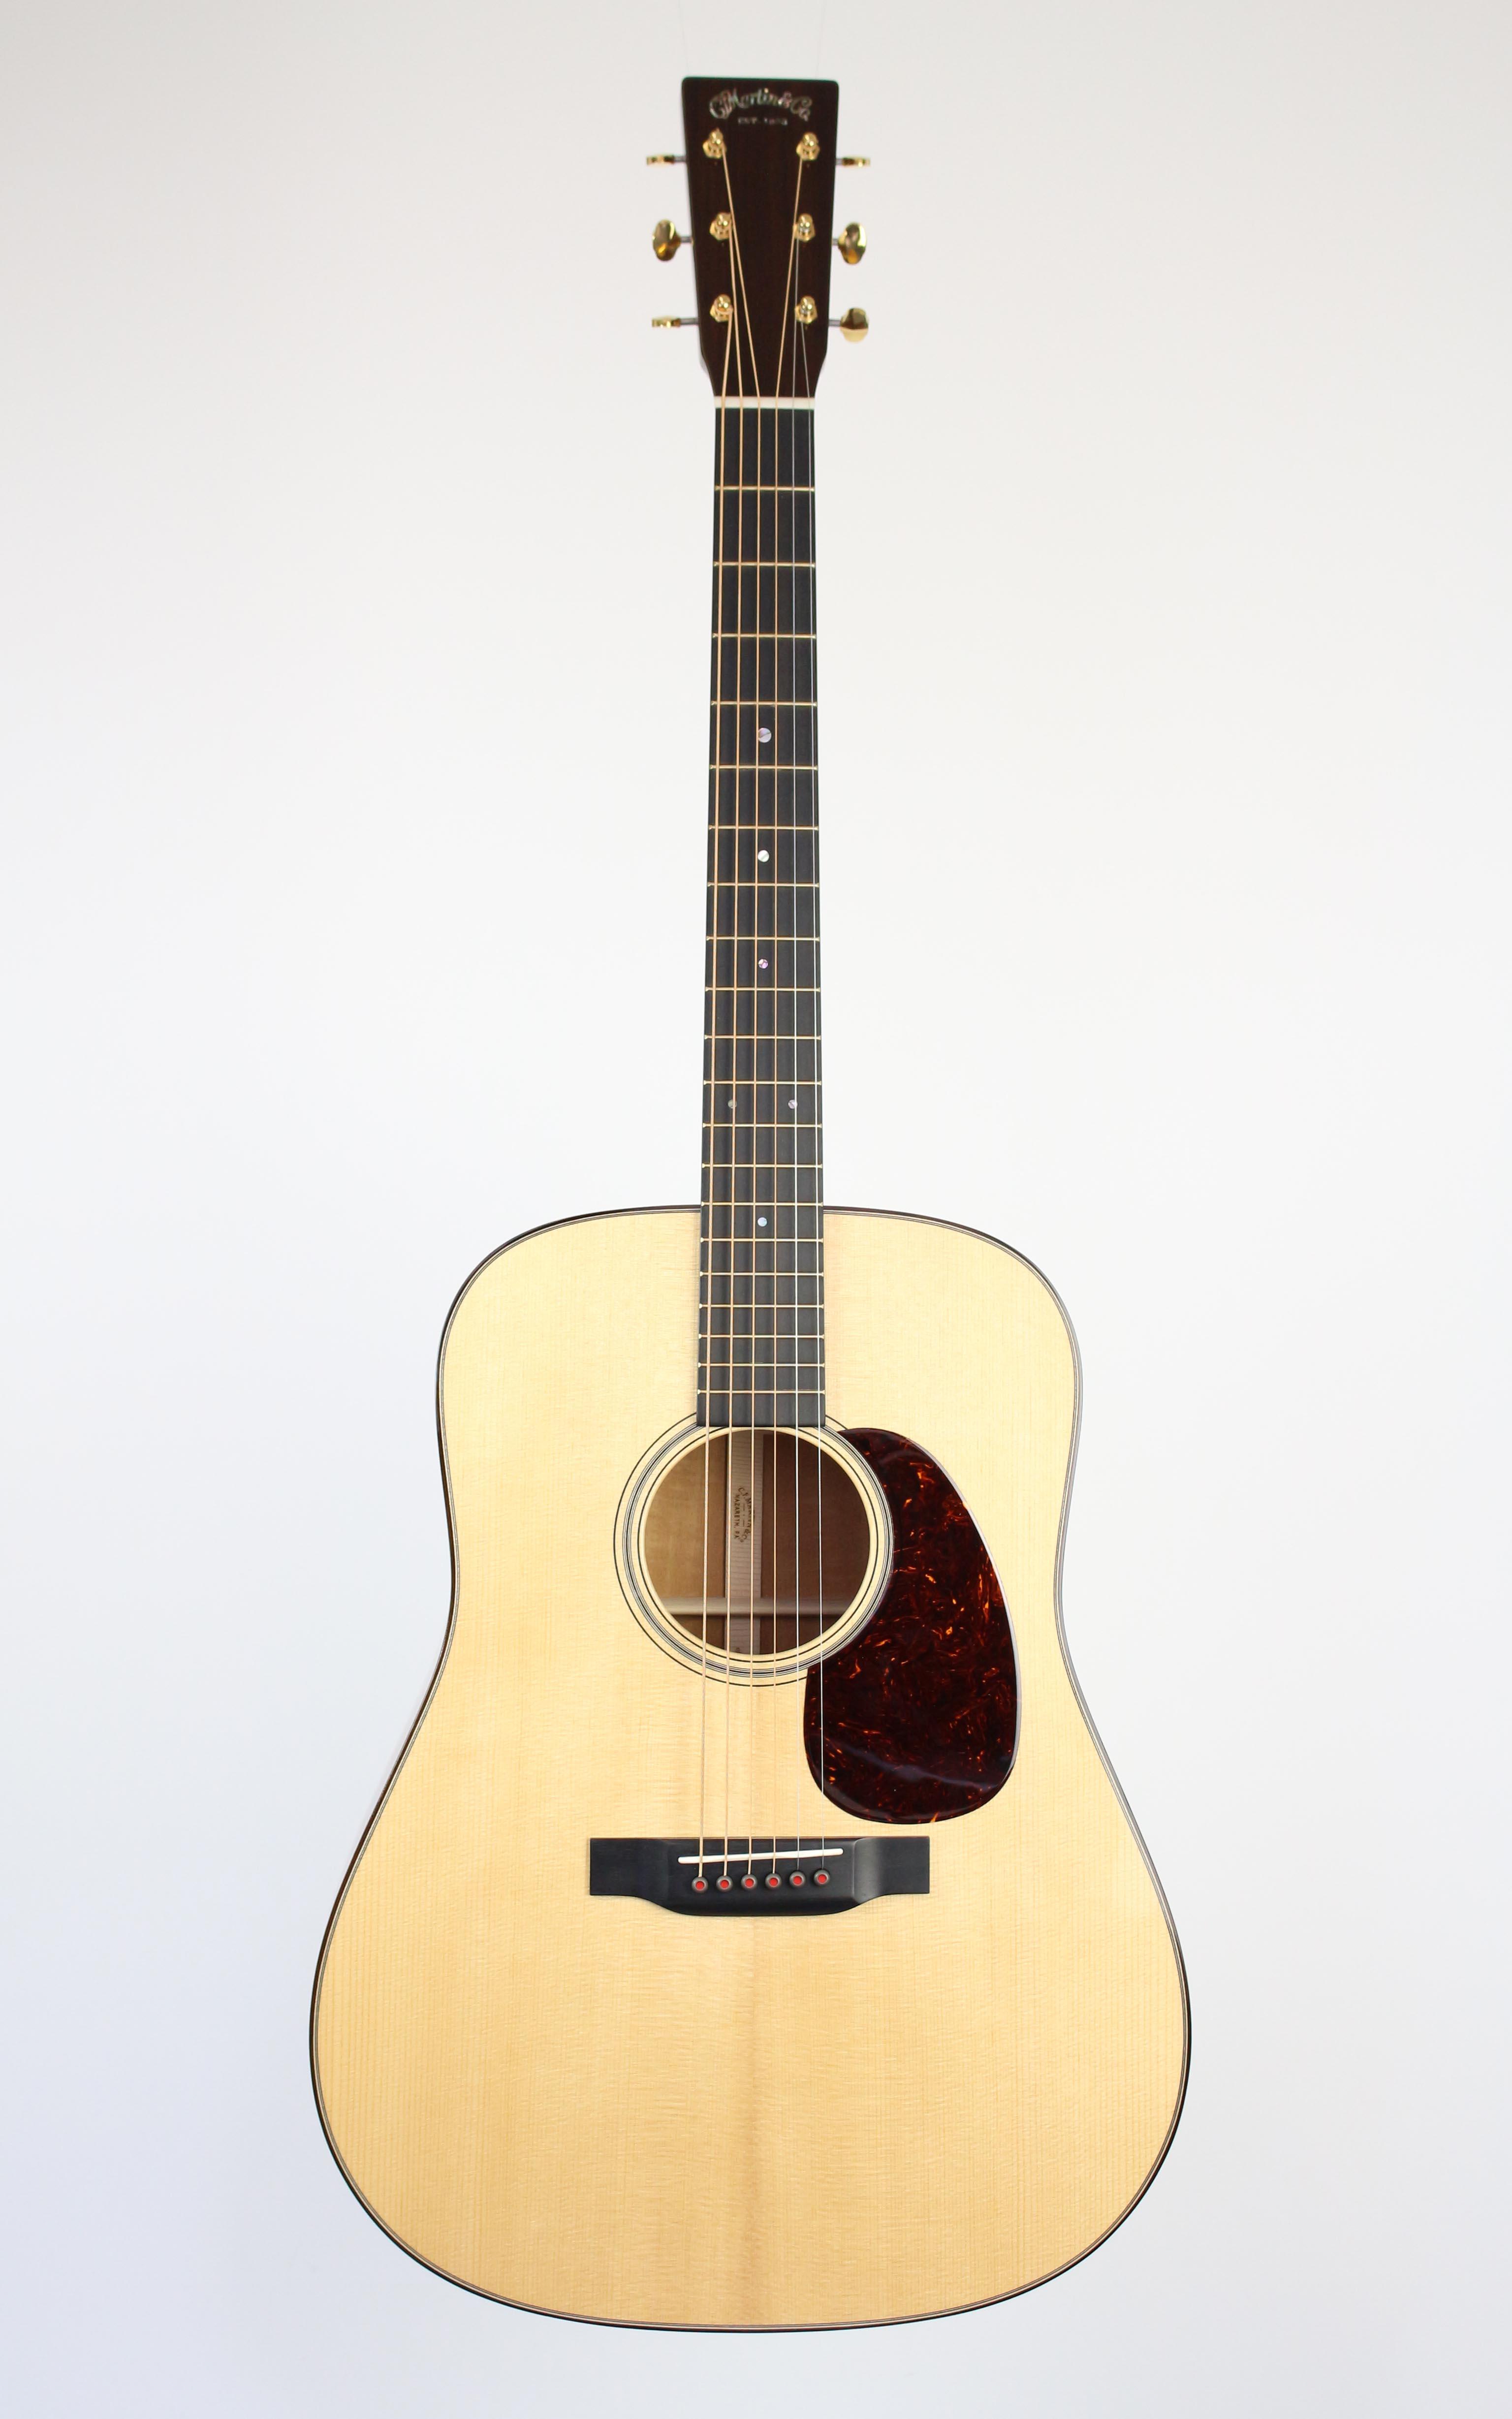 Martin - D-18 Modern Deluxe - Gitarren - Westerngitarren | MUSIK BERTRAM Deutschland Freiburg